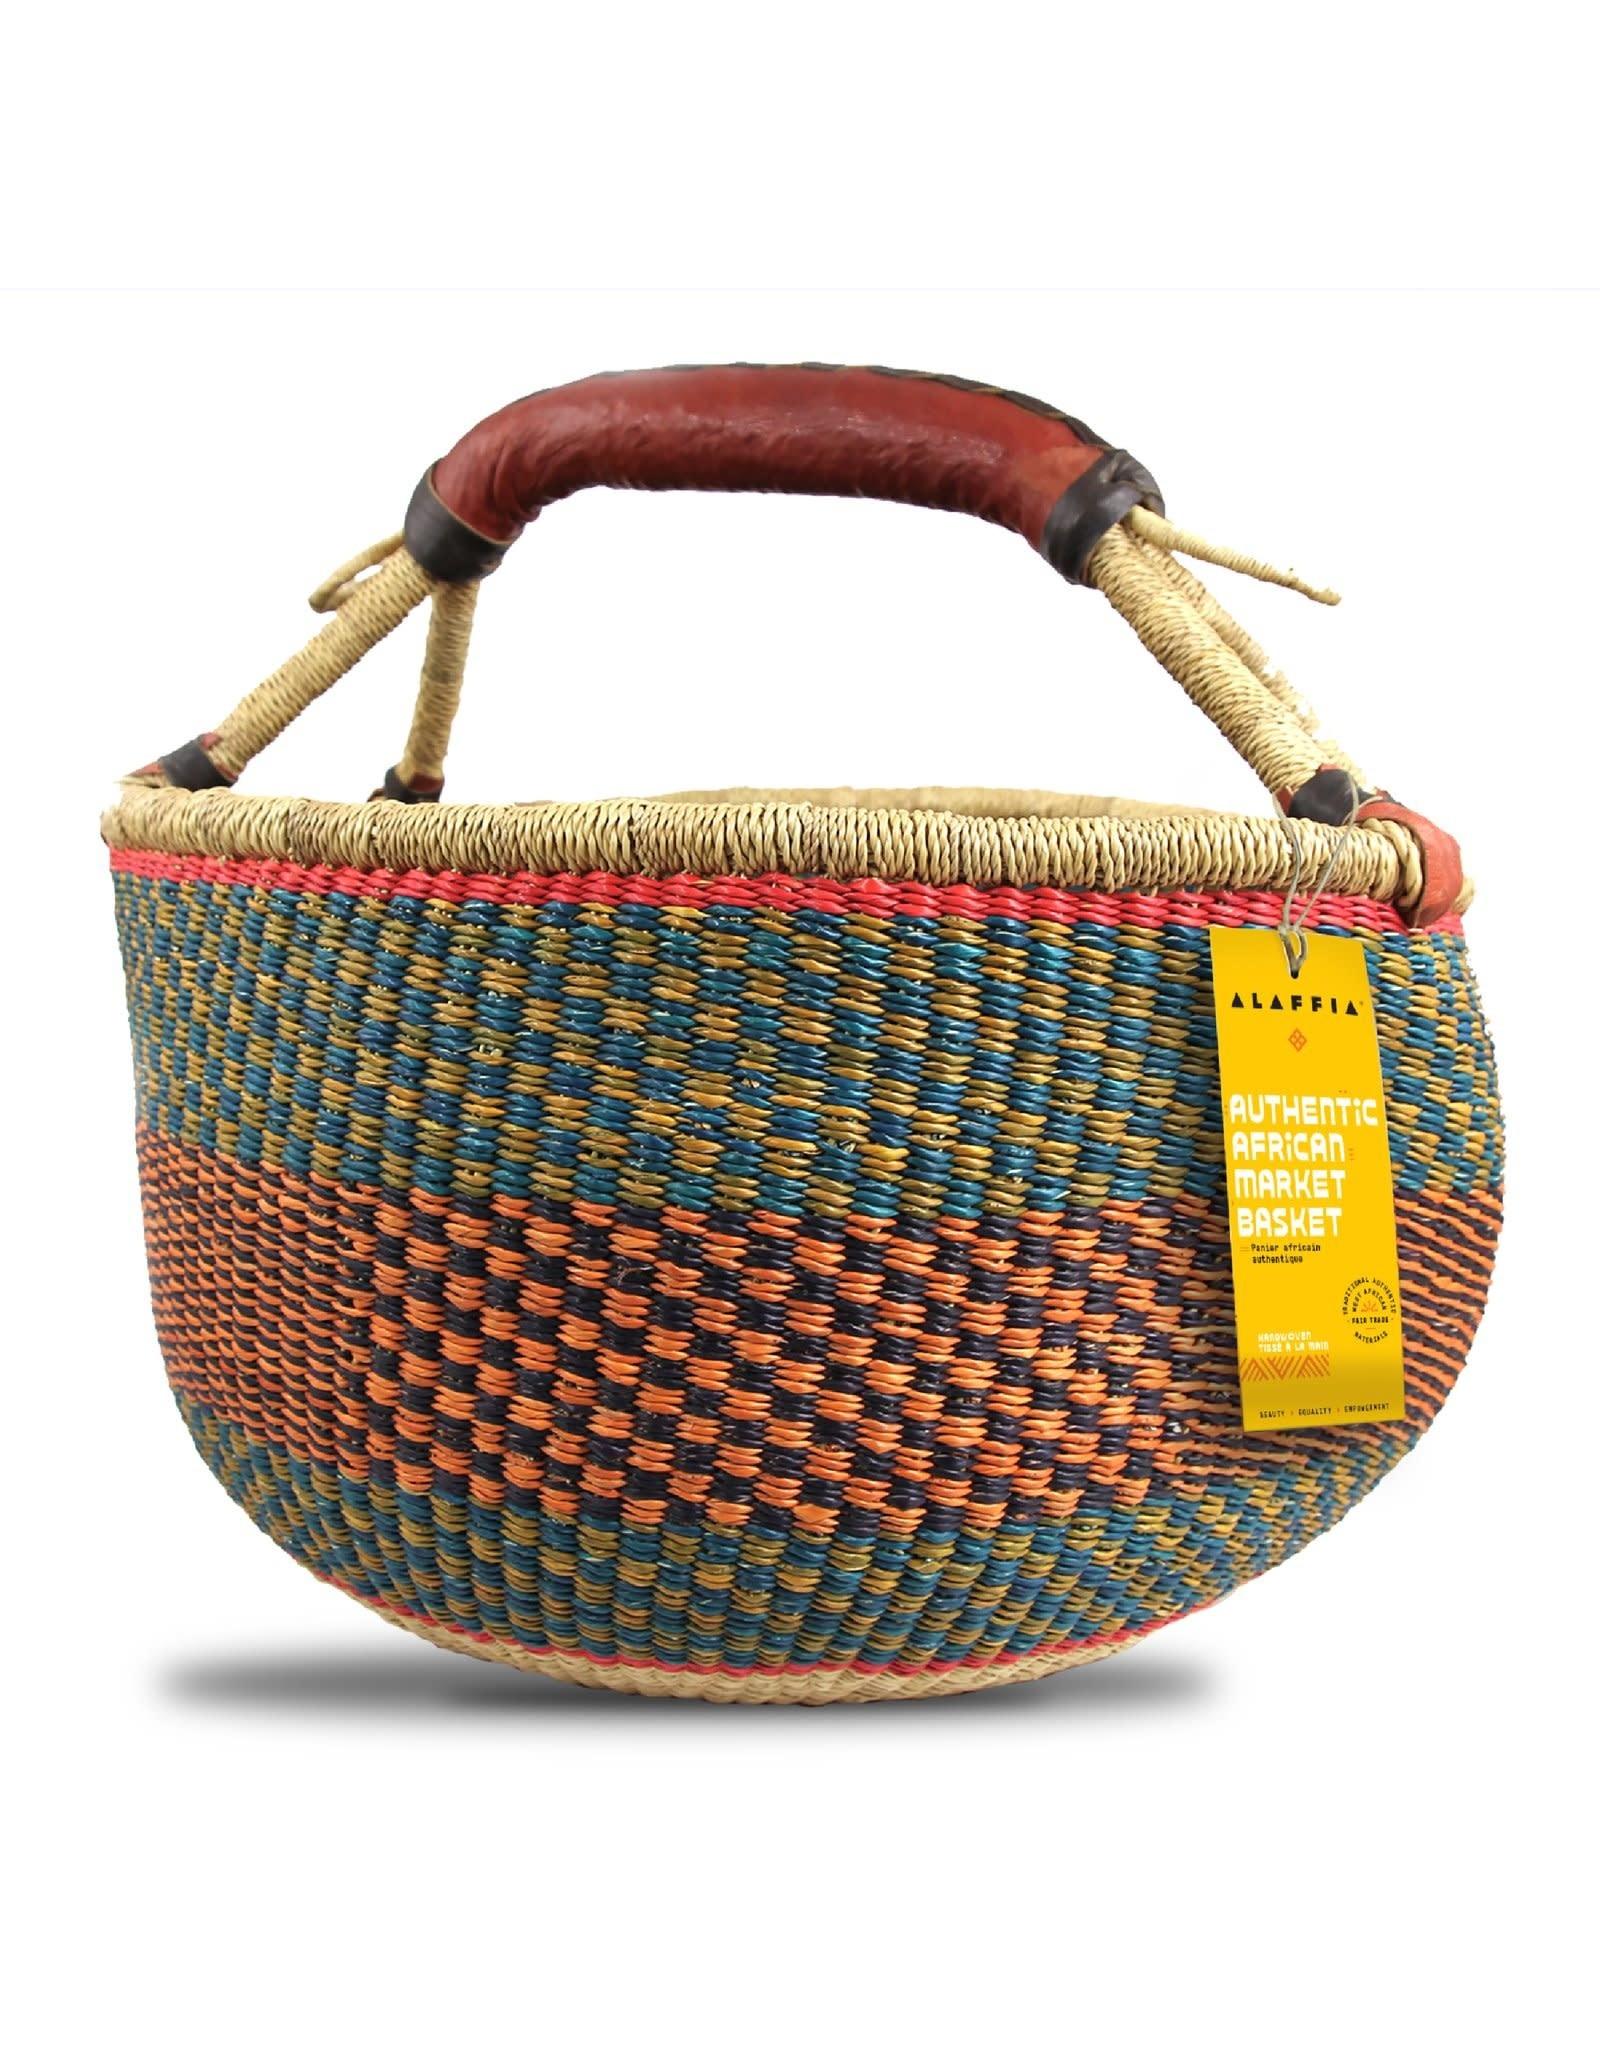 Alaffia Authentic African Market Basket